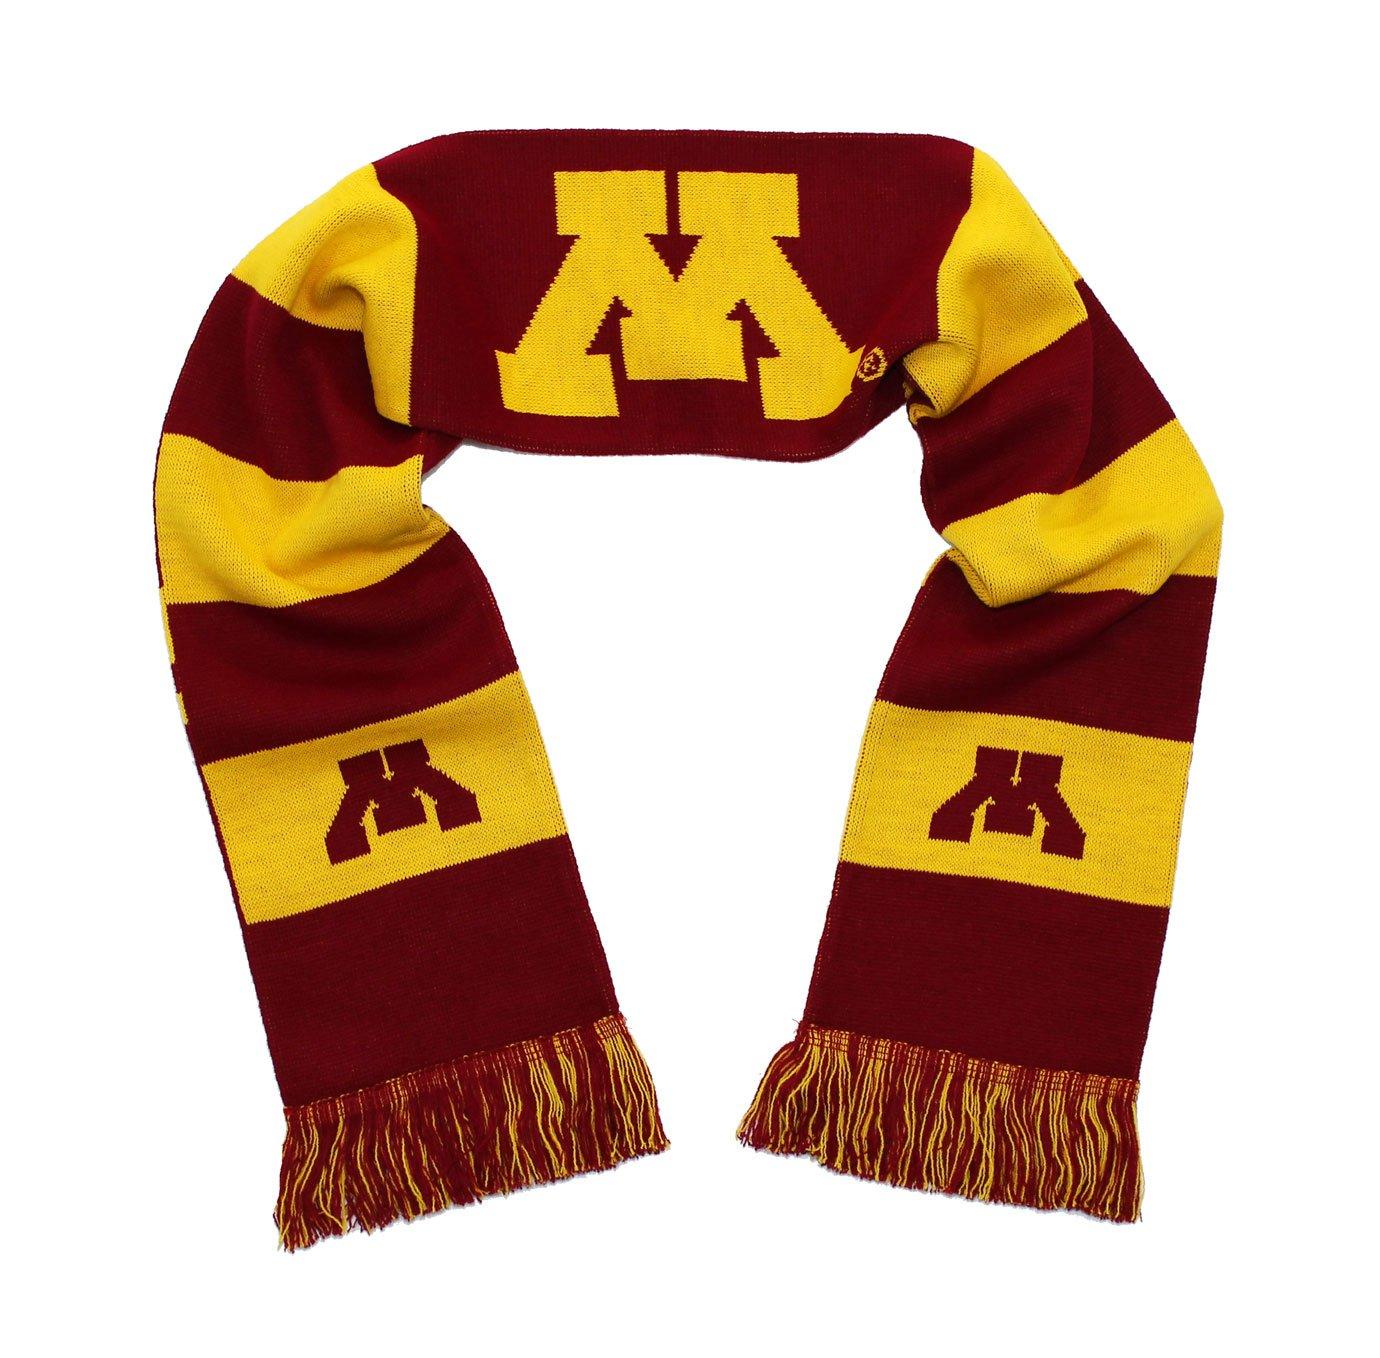 Minnesota Golden Gophers Scarf University of Minnesota Knitted